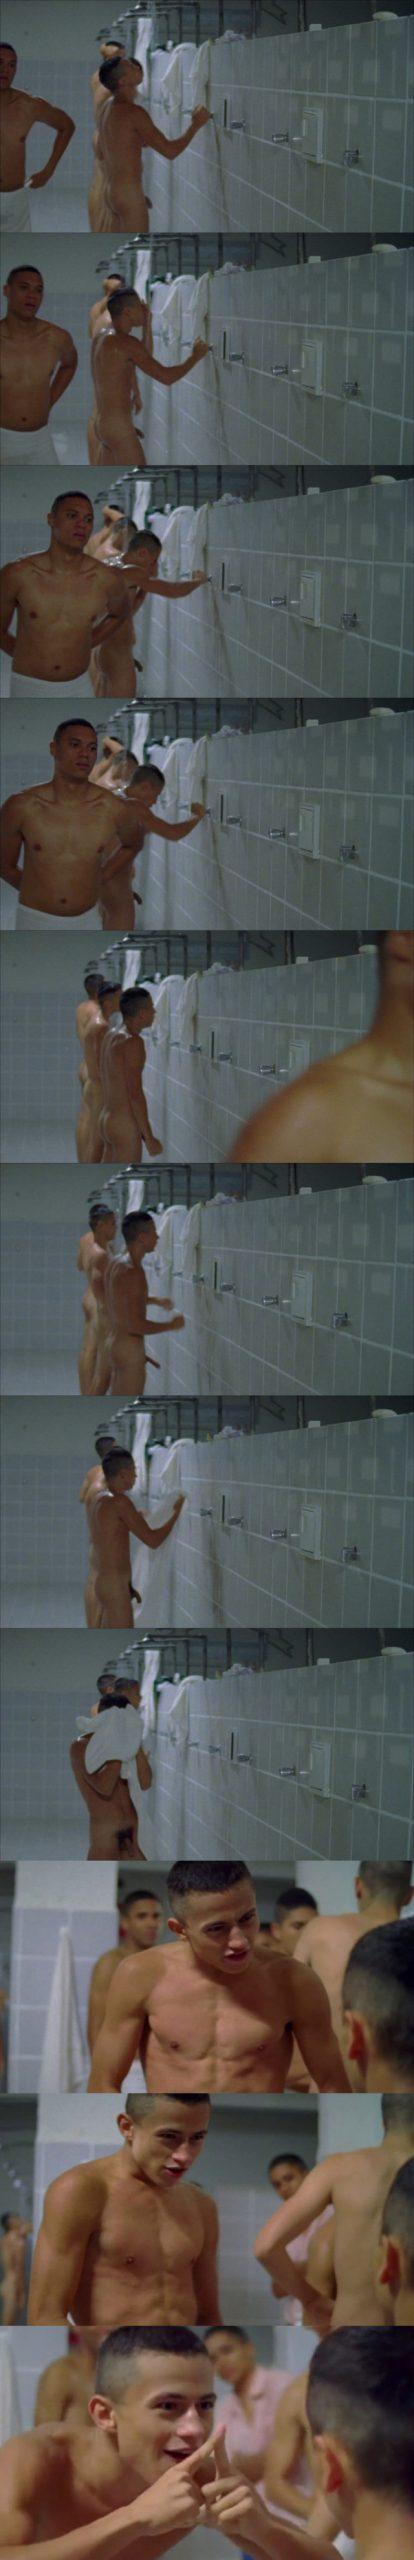 ariclenes barroso full frontal naked